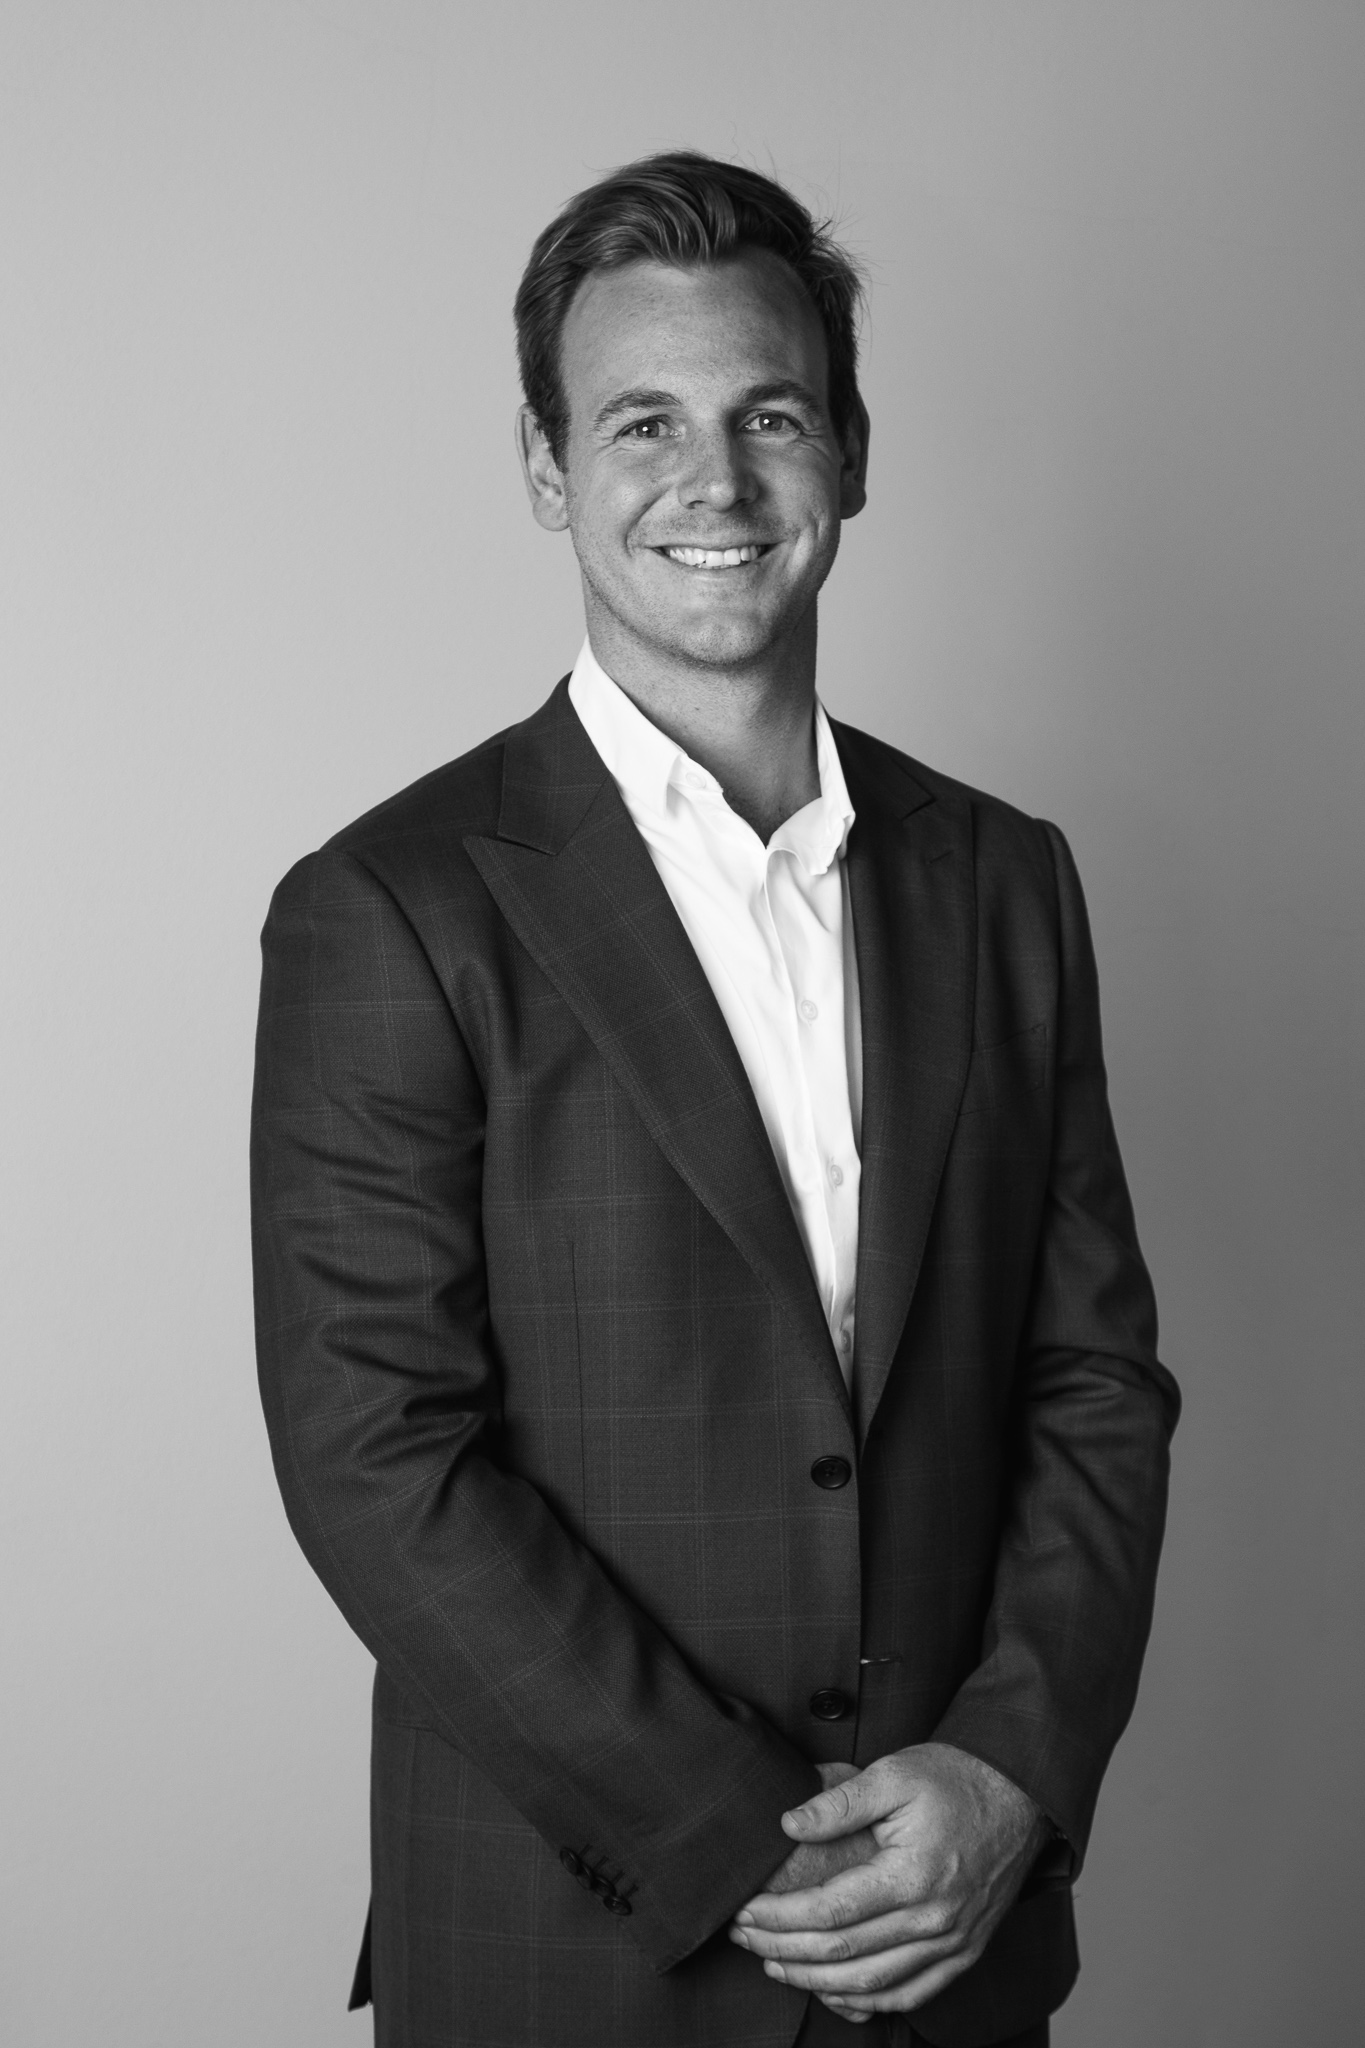 William Johnson - Director / Development & Project Manager